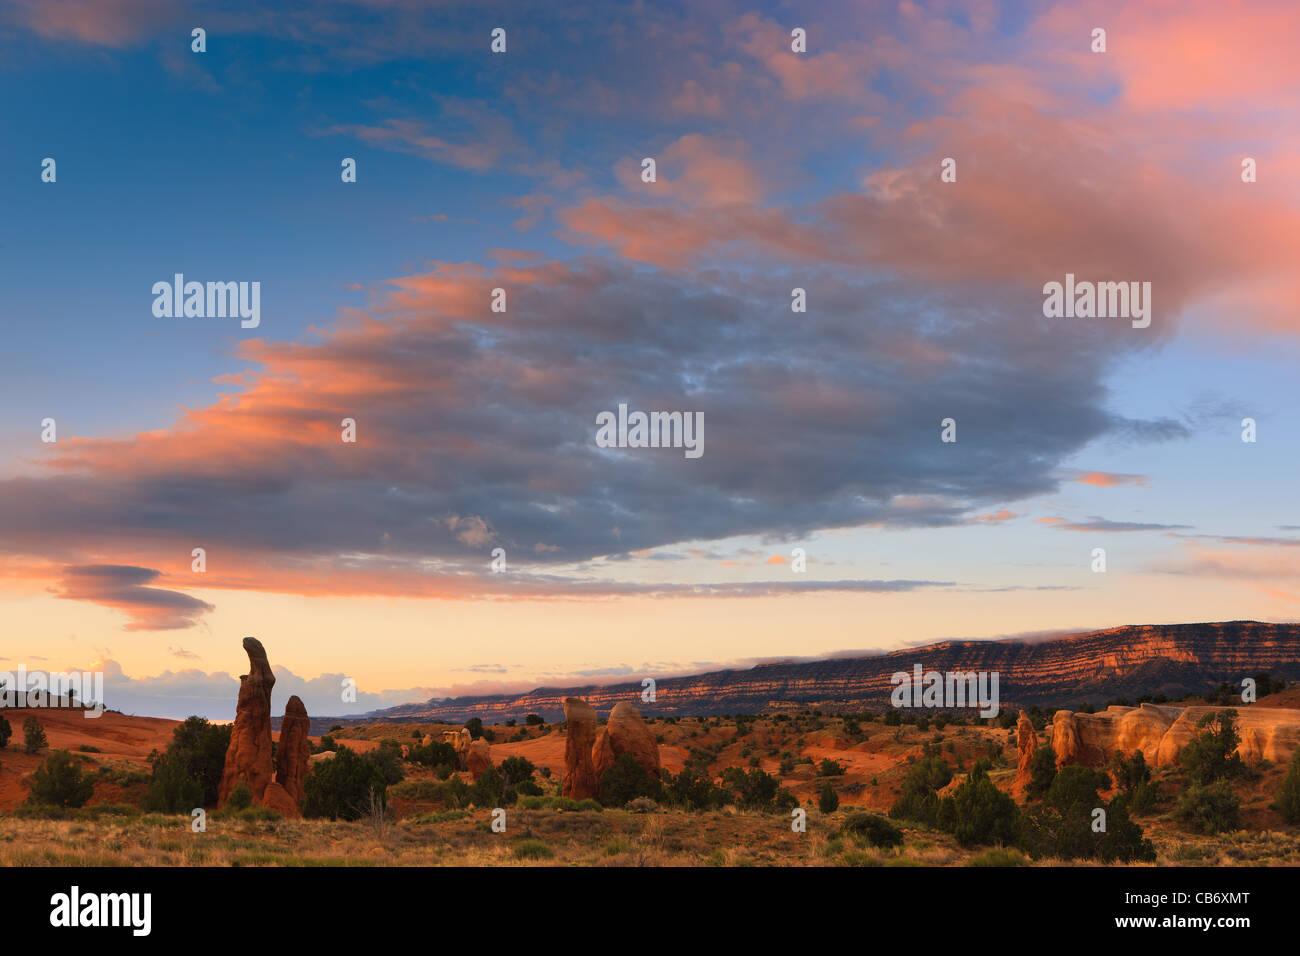 Devils Garden at sunrise near Escalante, Grand Staircase Escalante National Monument, Utah Stock Photo